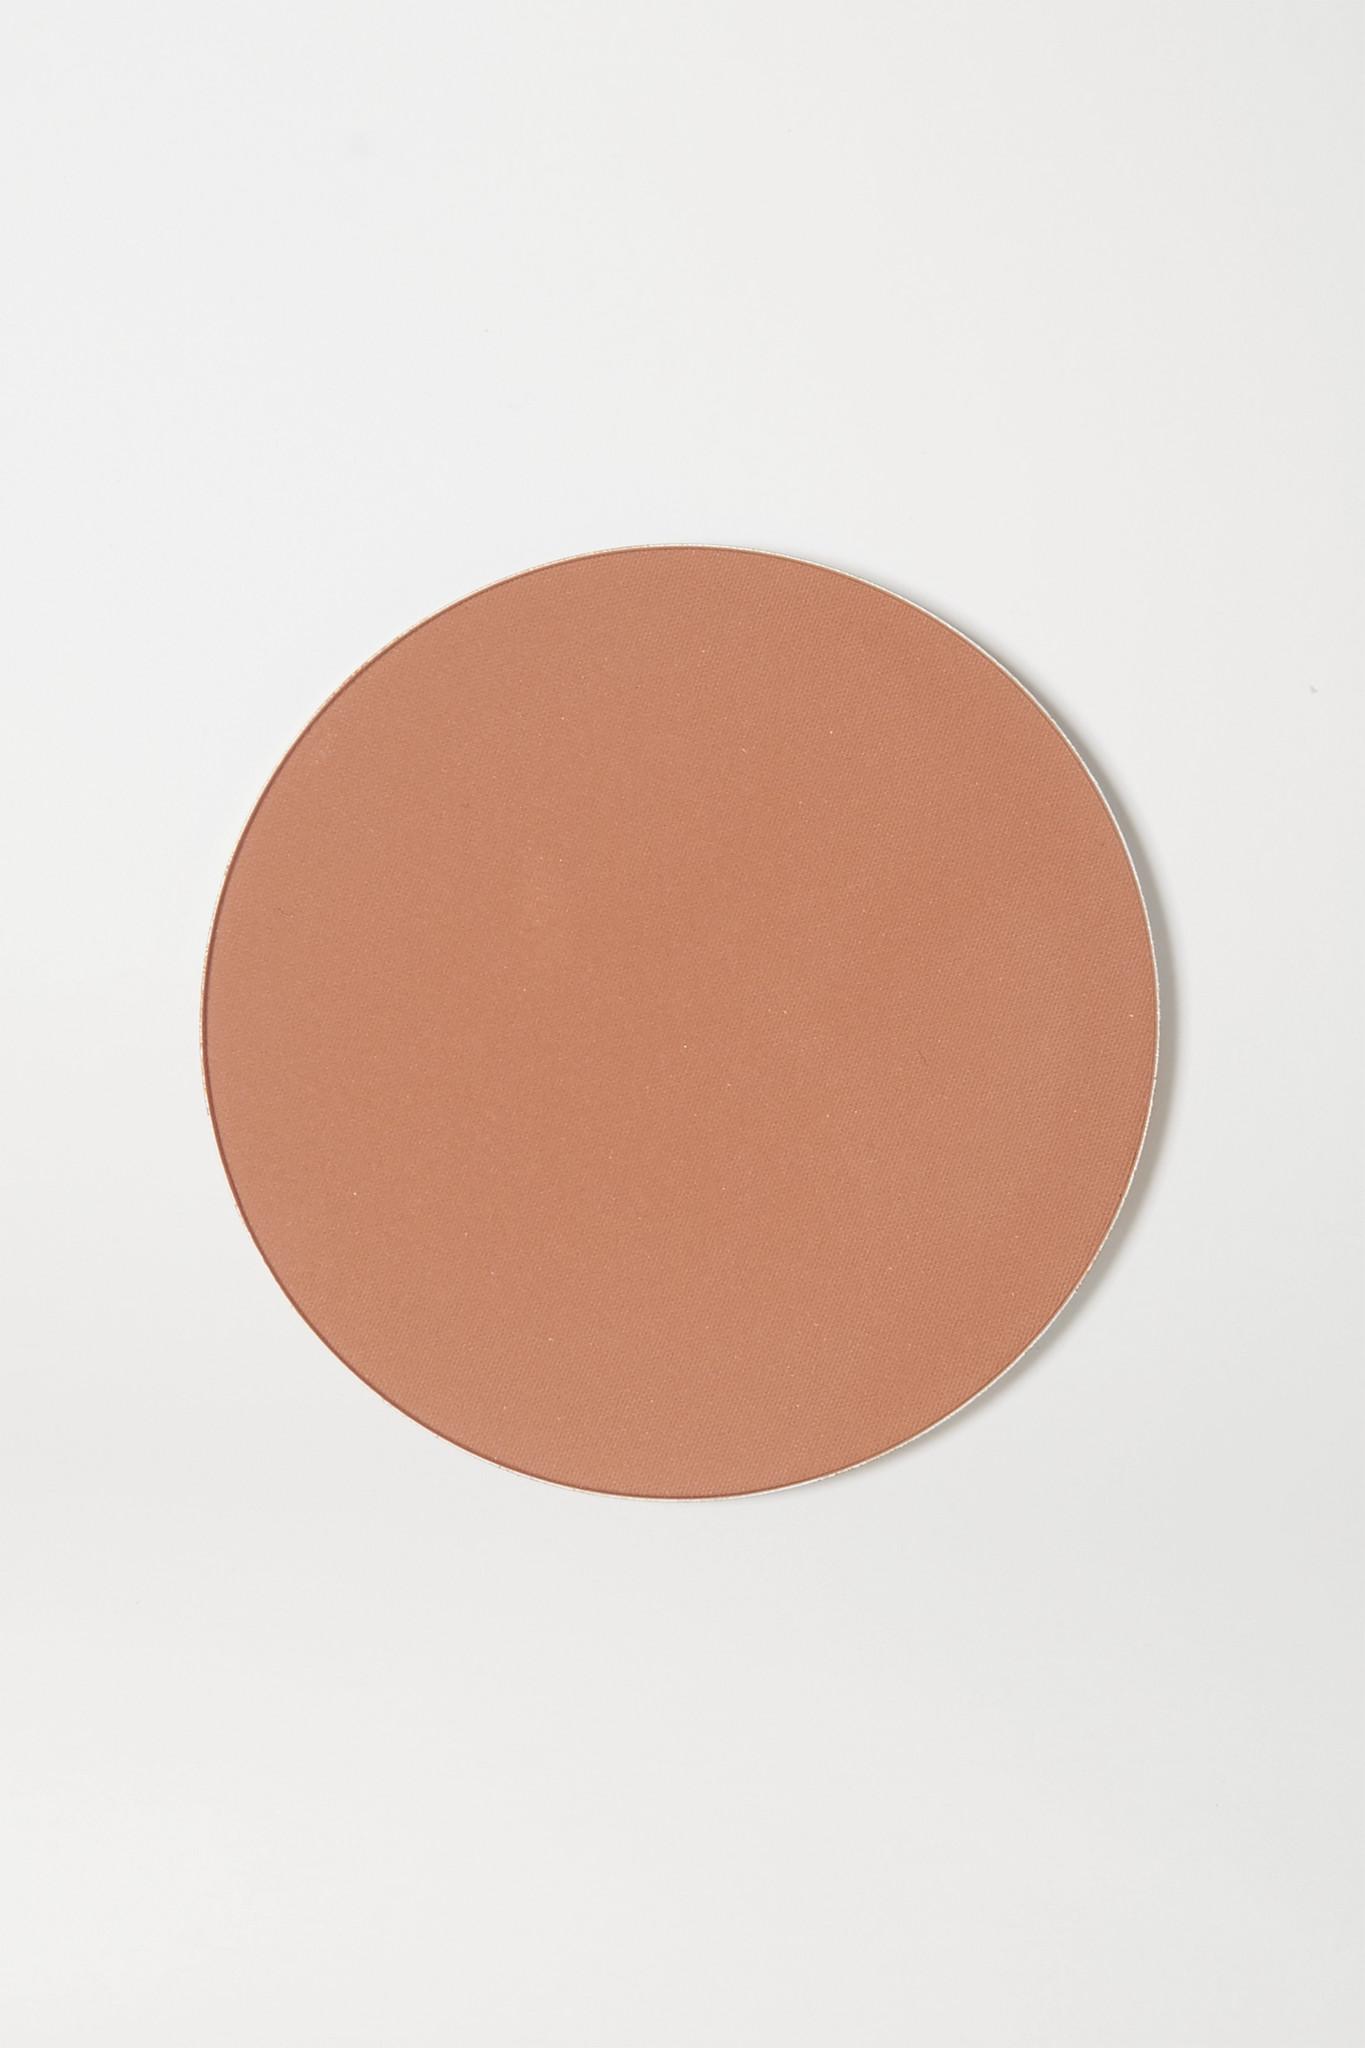 CHARLOTTE TILBURY - Airbrush Bronzer Refill - 2 Medium - Brown - one size